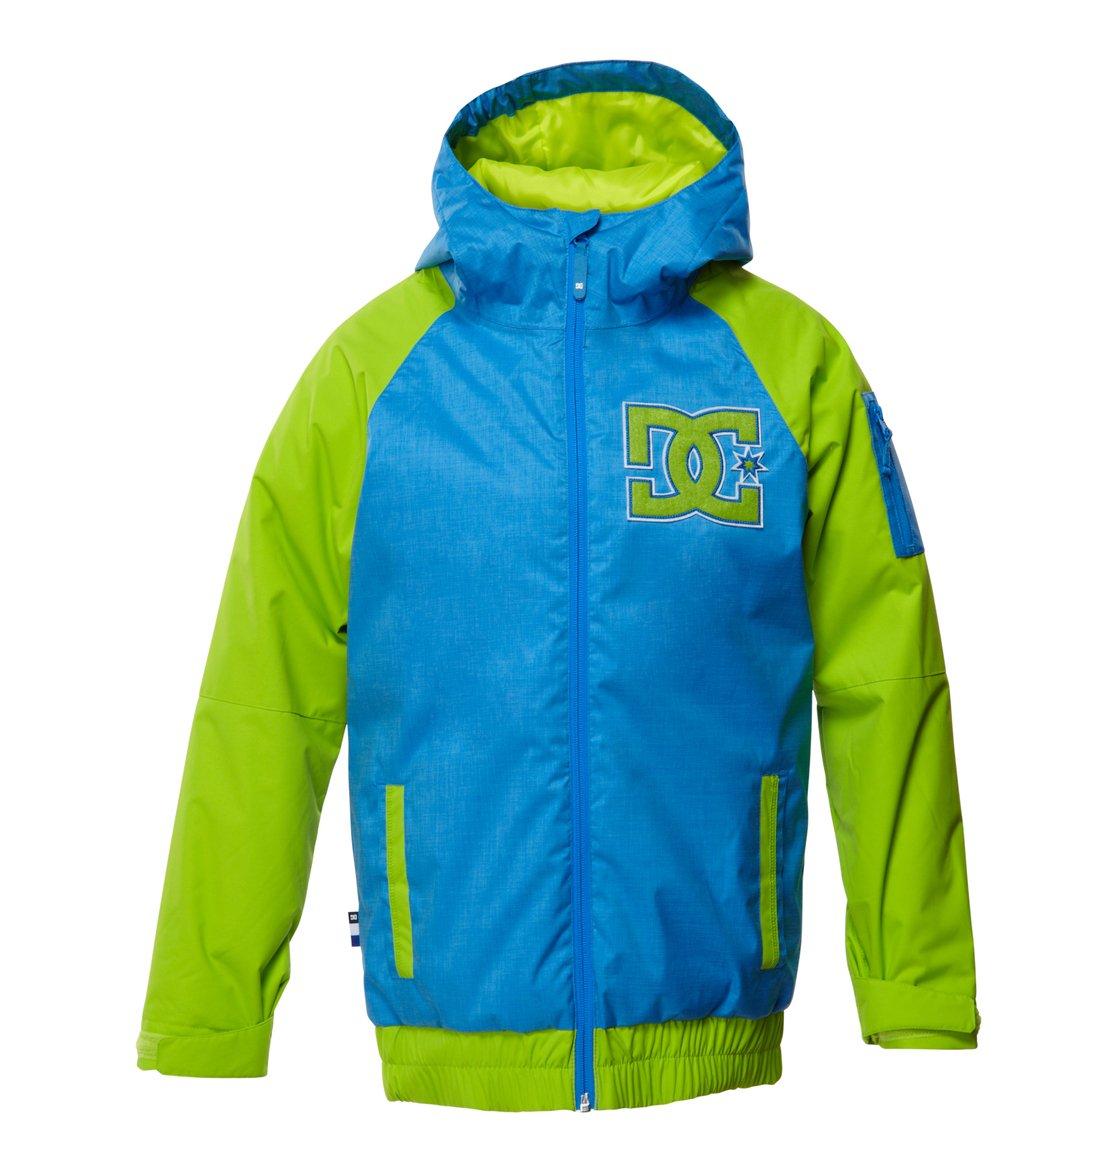 757a822c4 0 Boy's Troop Snow Jacket EDBTJ00008 DC Shoes